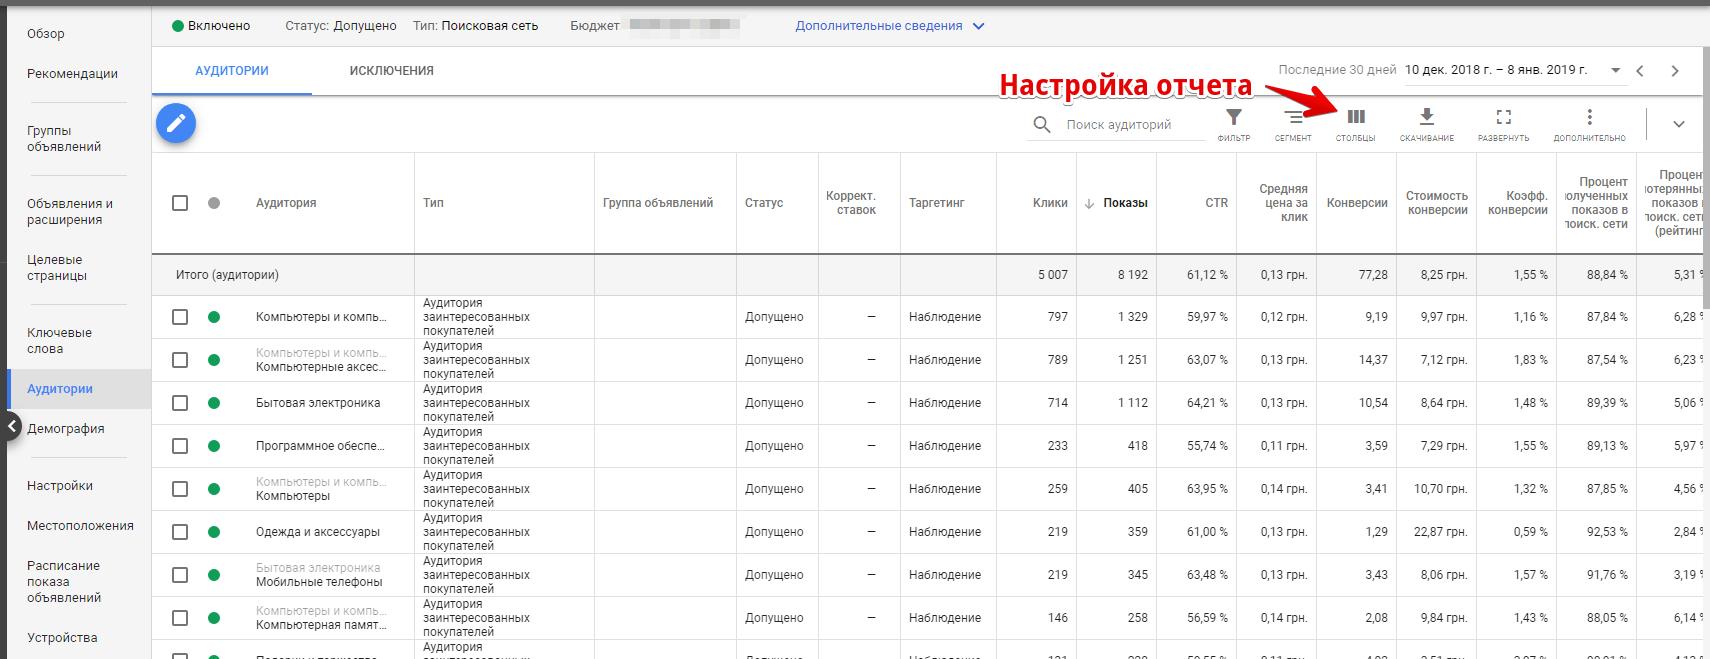 Отчет по аудиториям в Google Ads